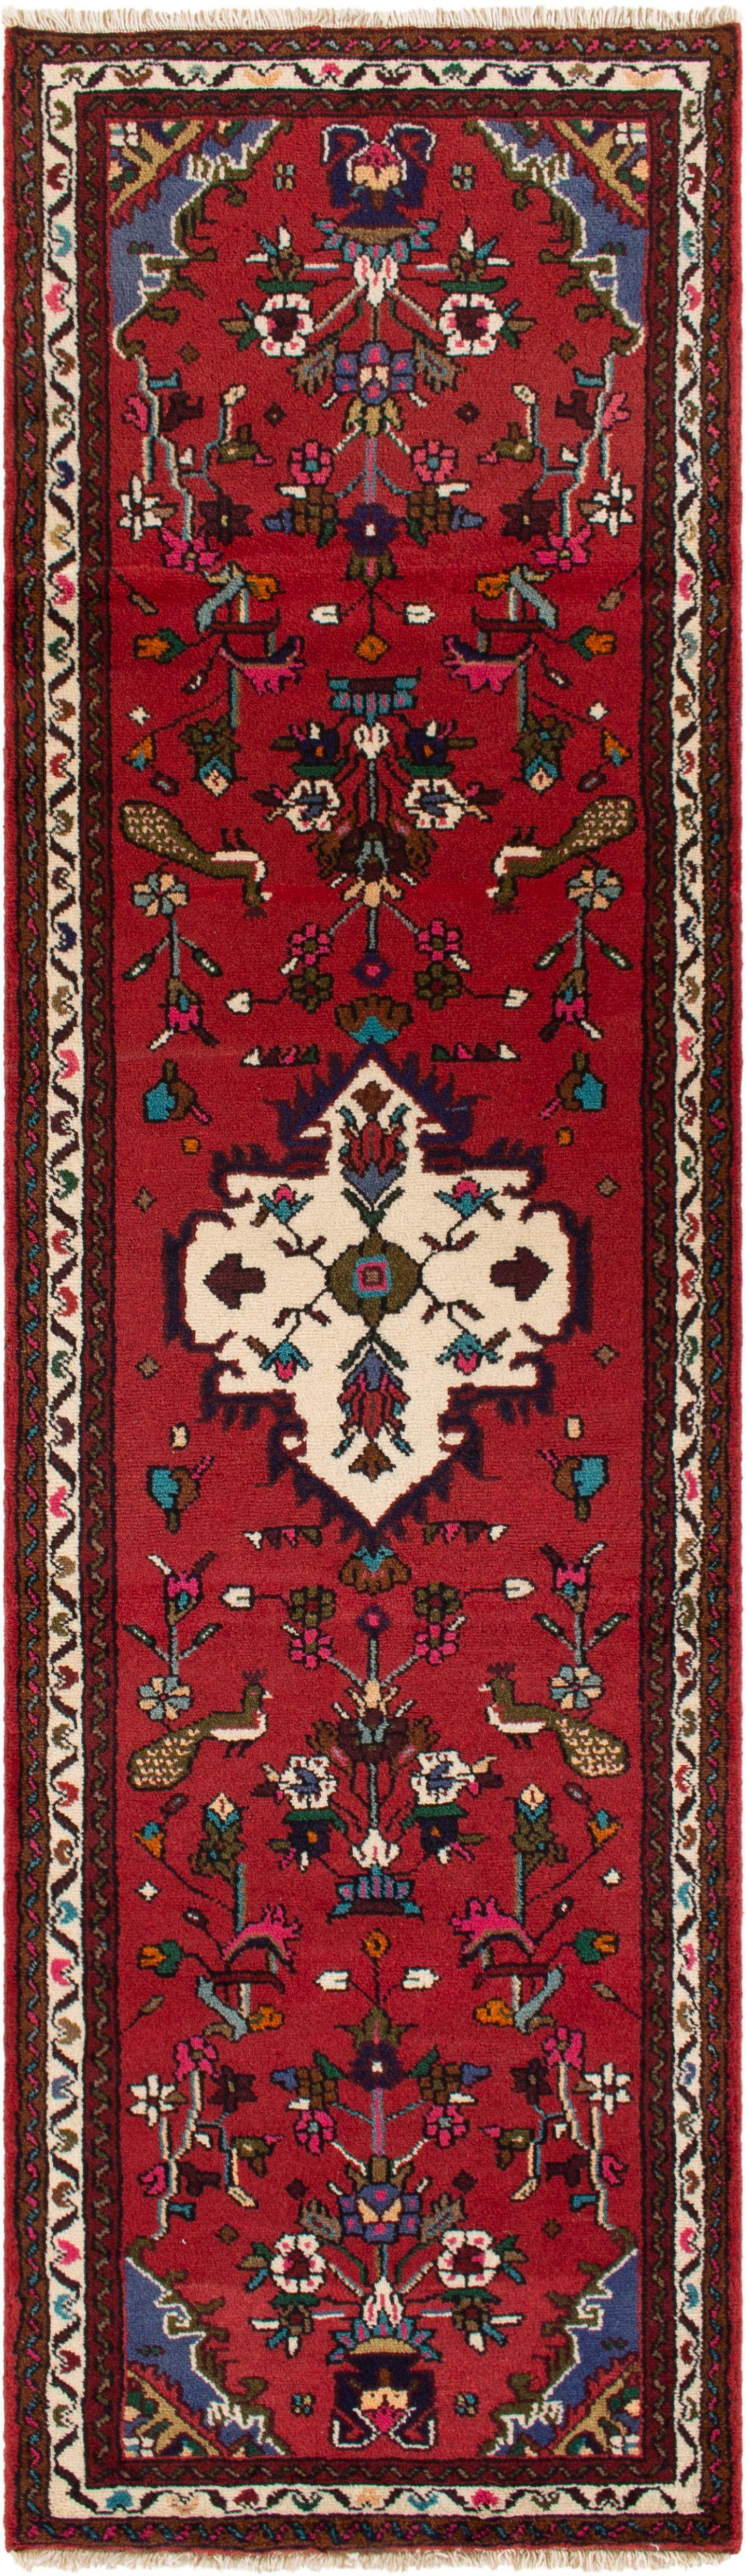 "Hand-knotted Hamadan  Wool Rug 2'7"" x 9'5"" Size: 2'7"" x 9'5"""